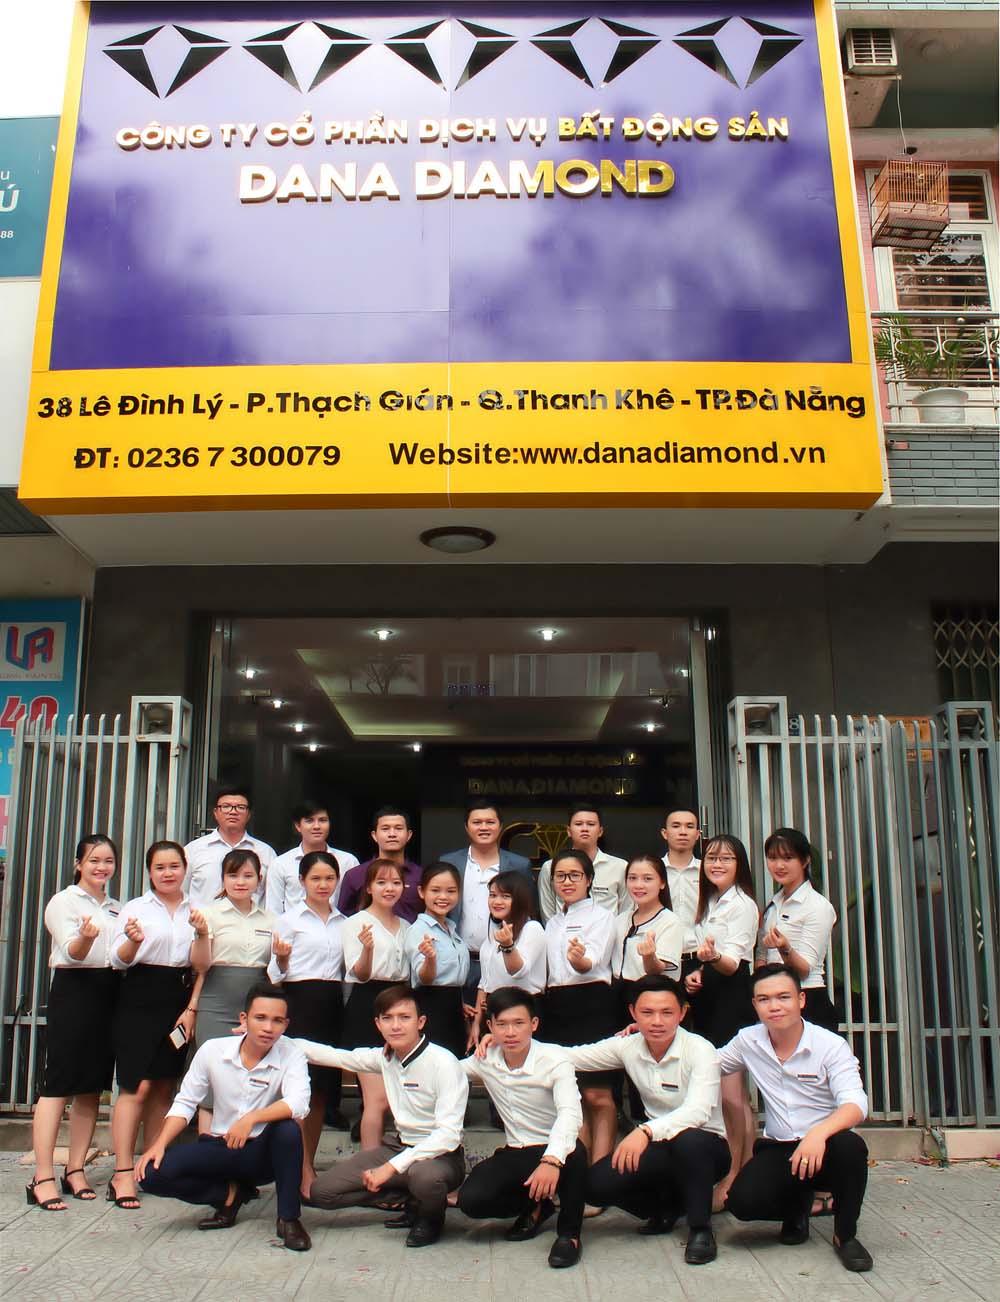 danadiamond